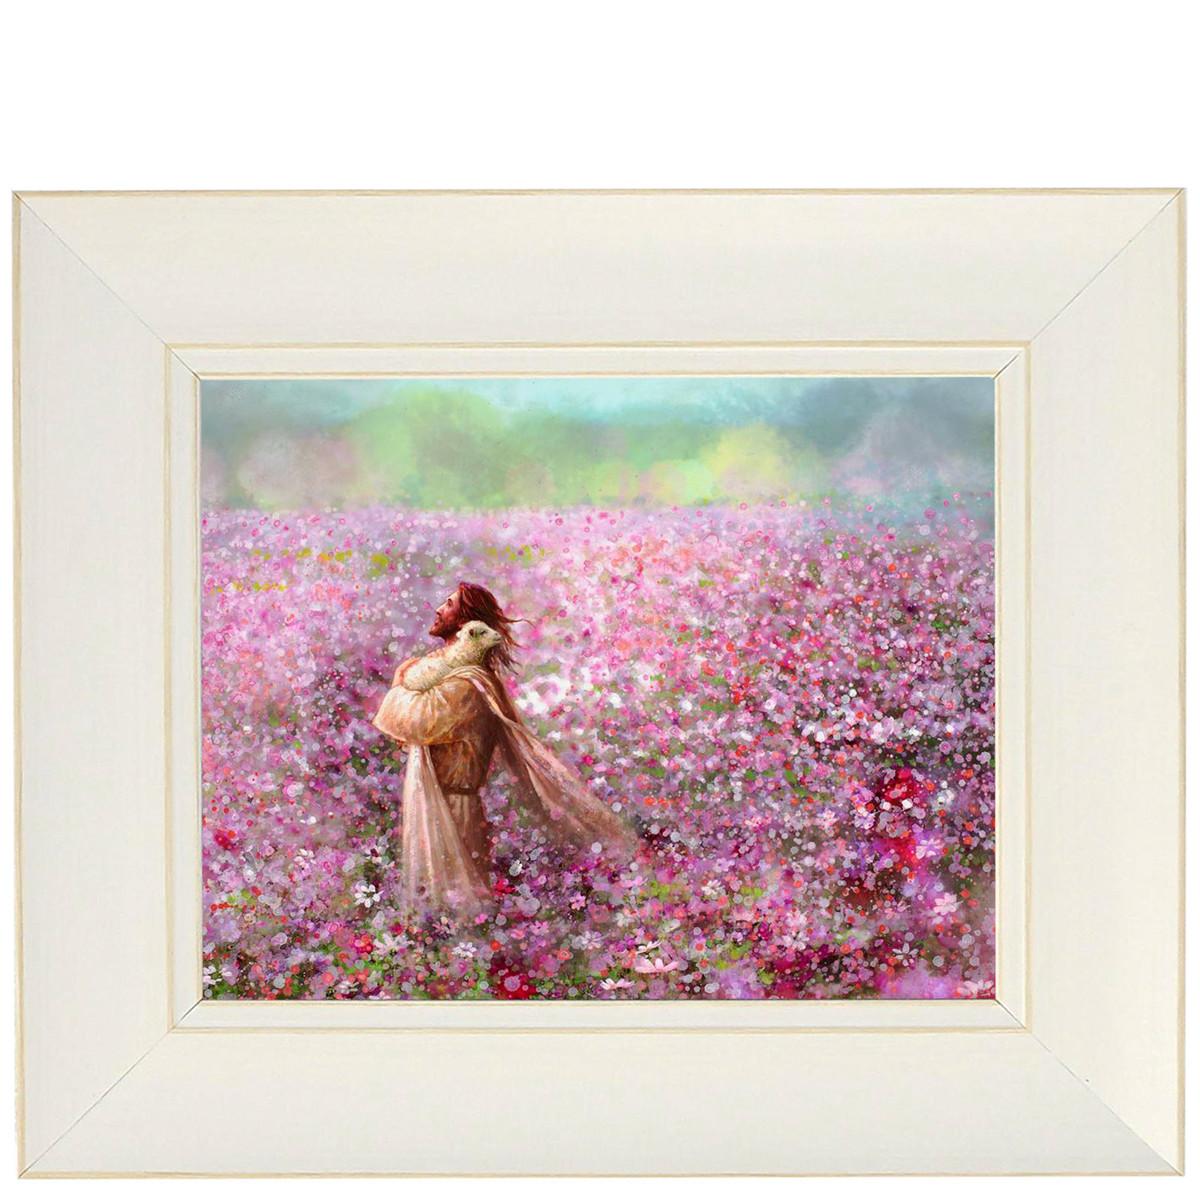 Yongsung Kim Framed Prints